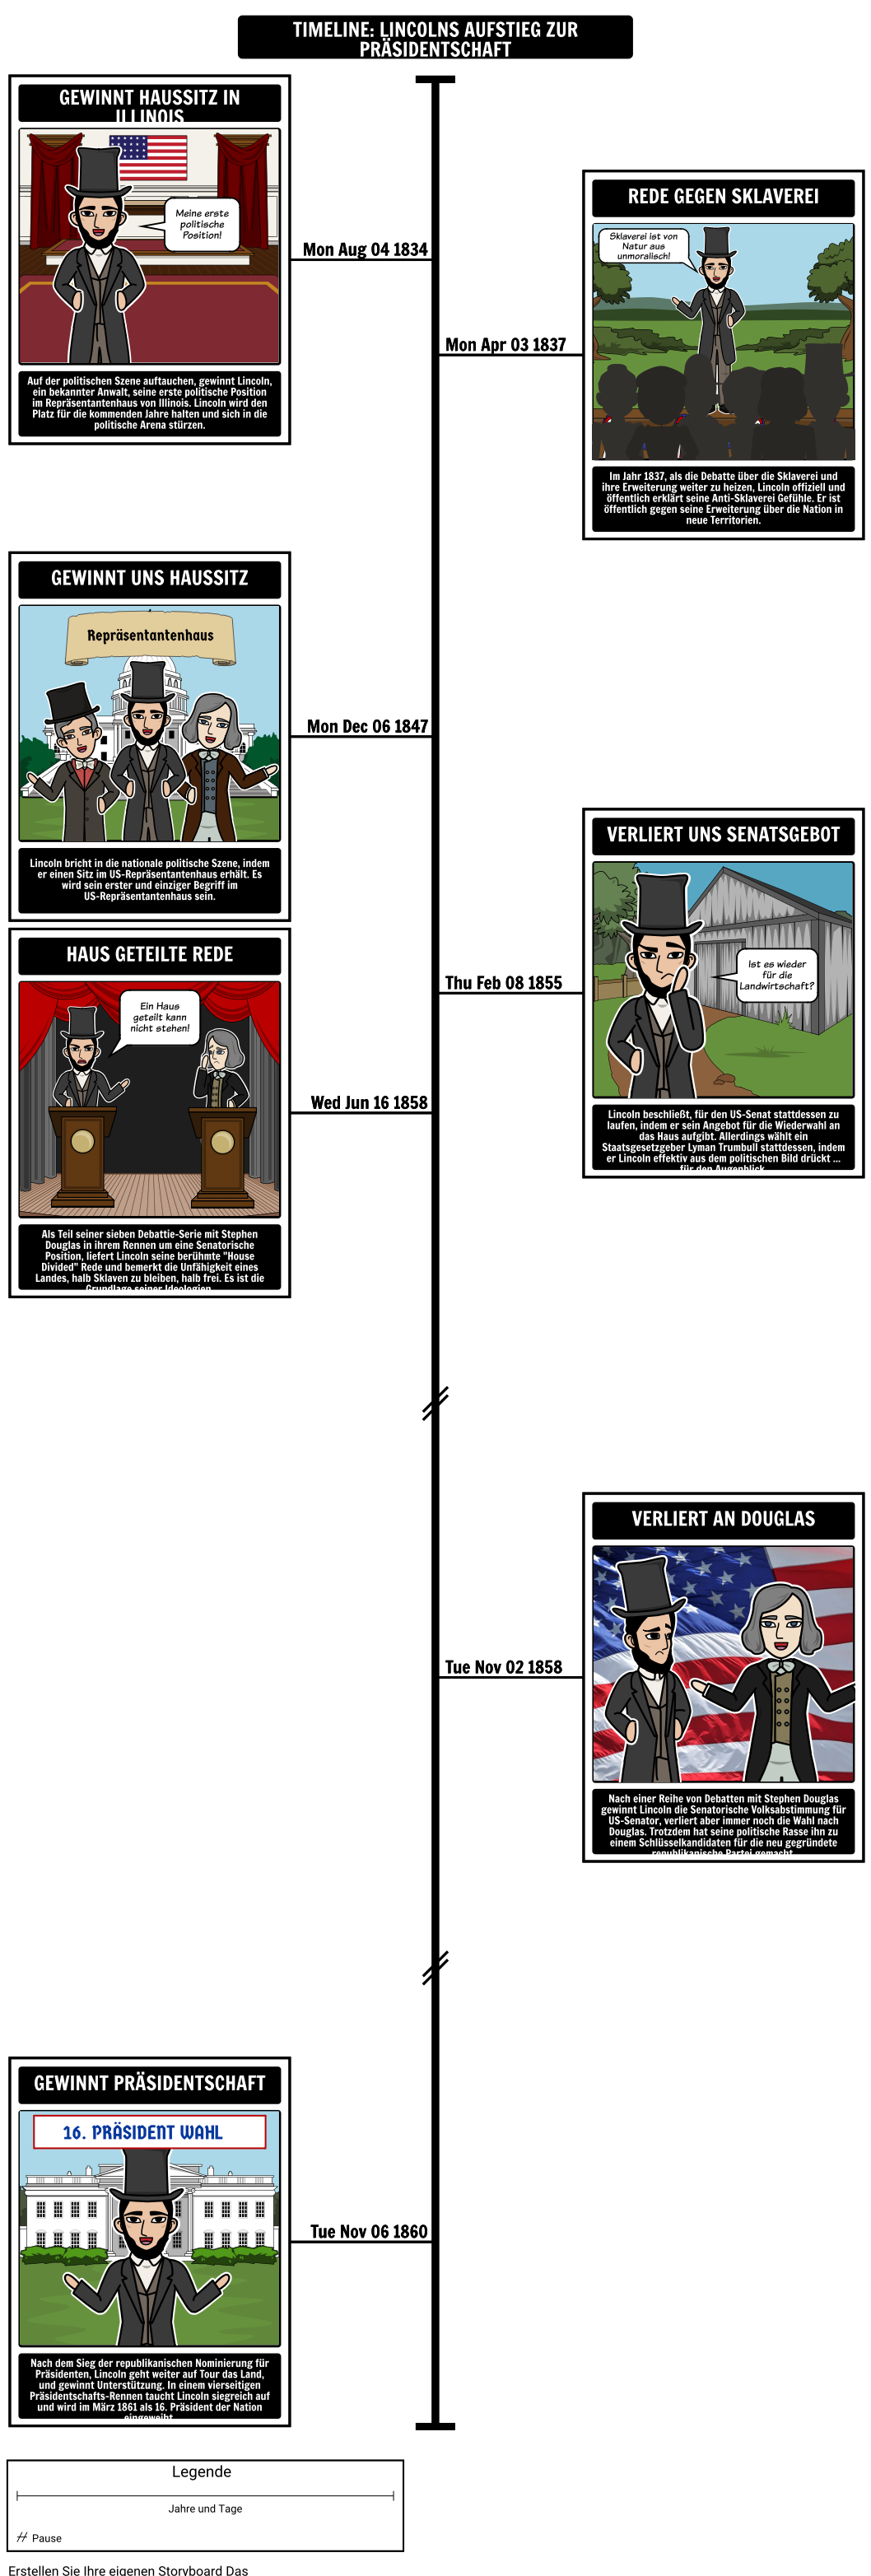 Präsident Abraham Lincoln Timeline - Emanzipation Proklamation